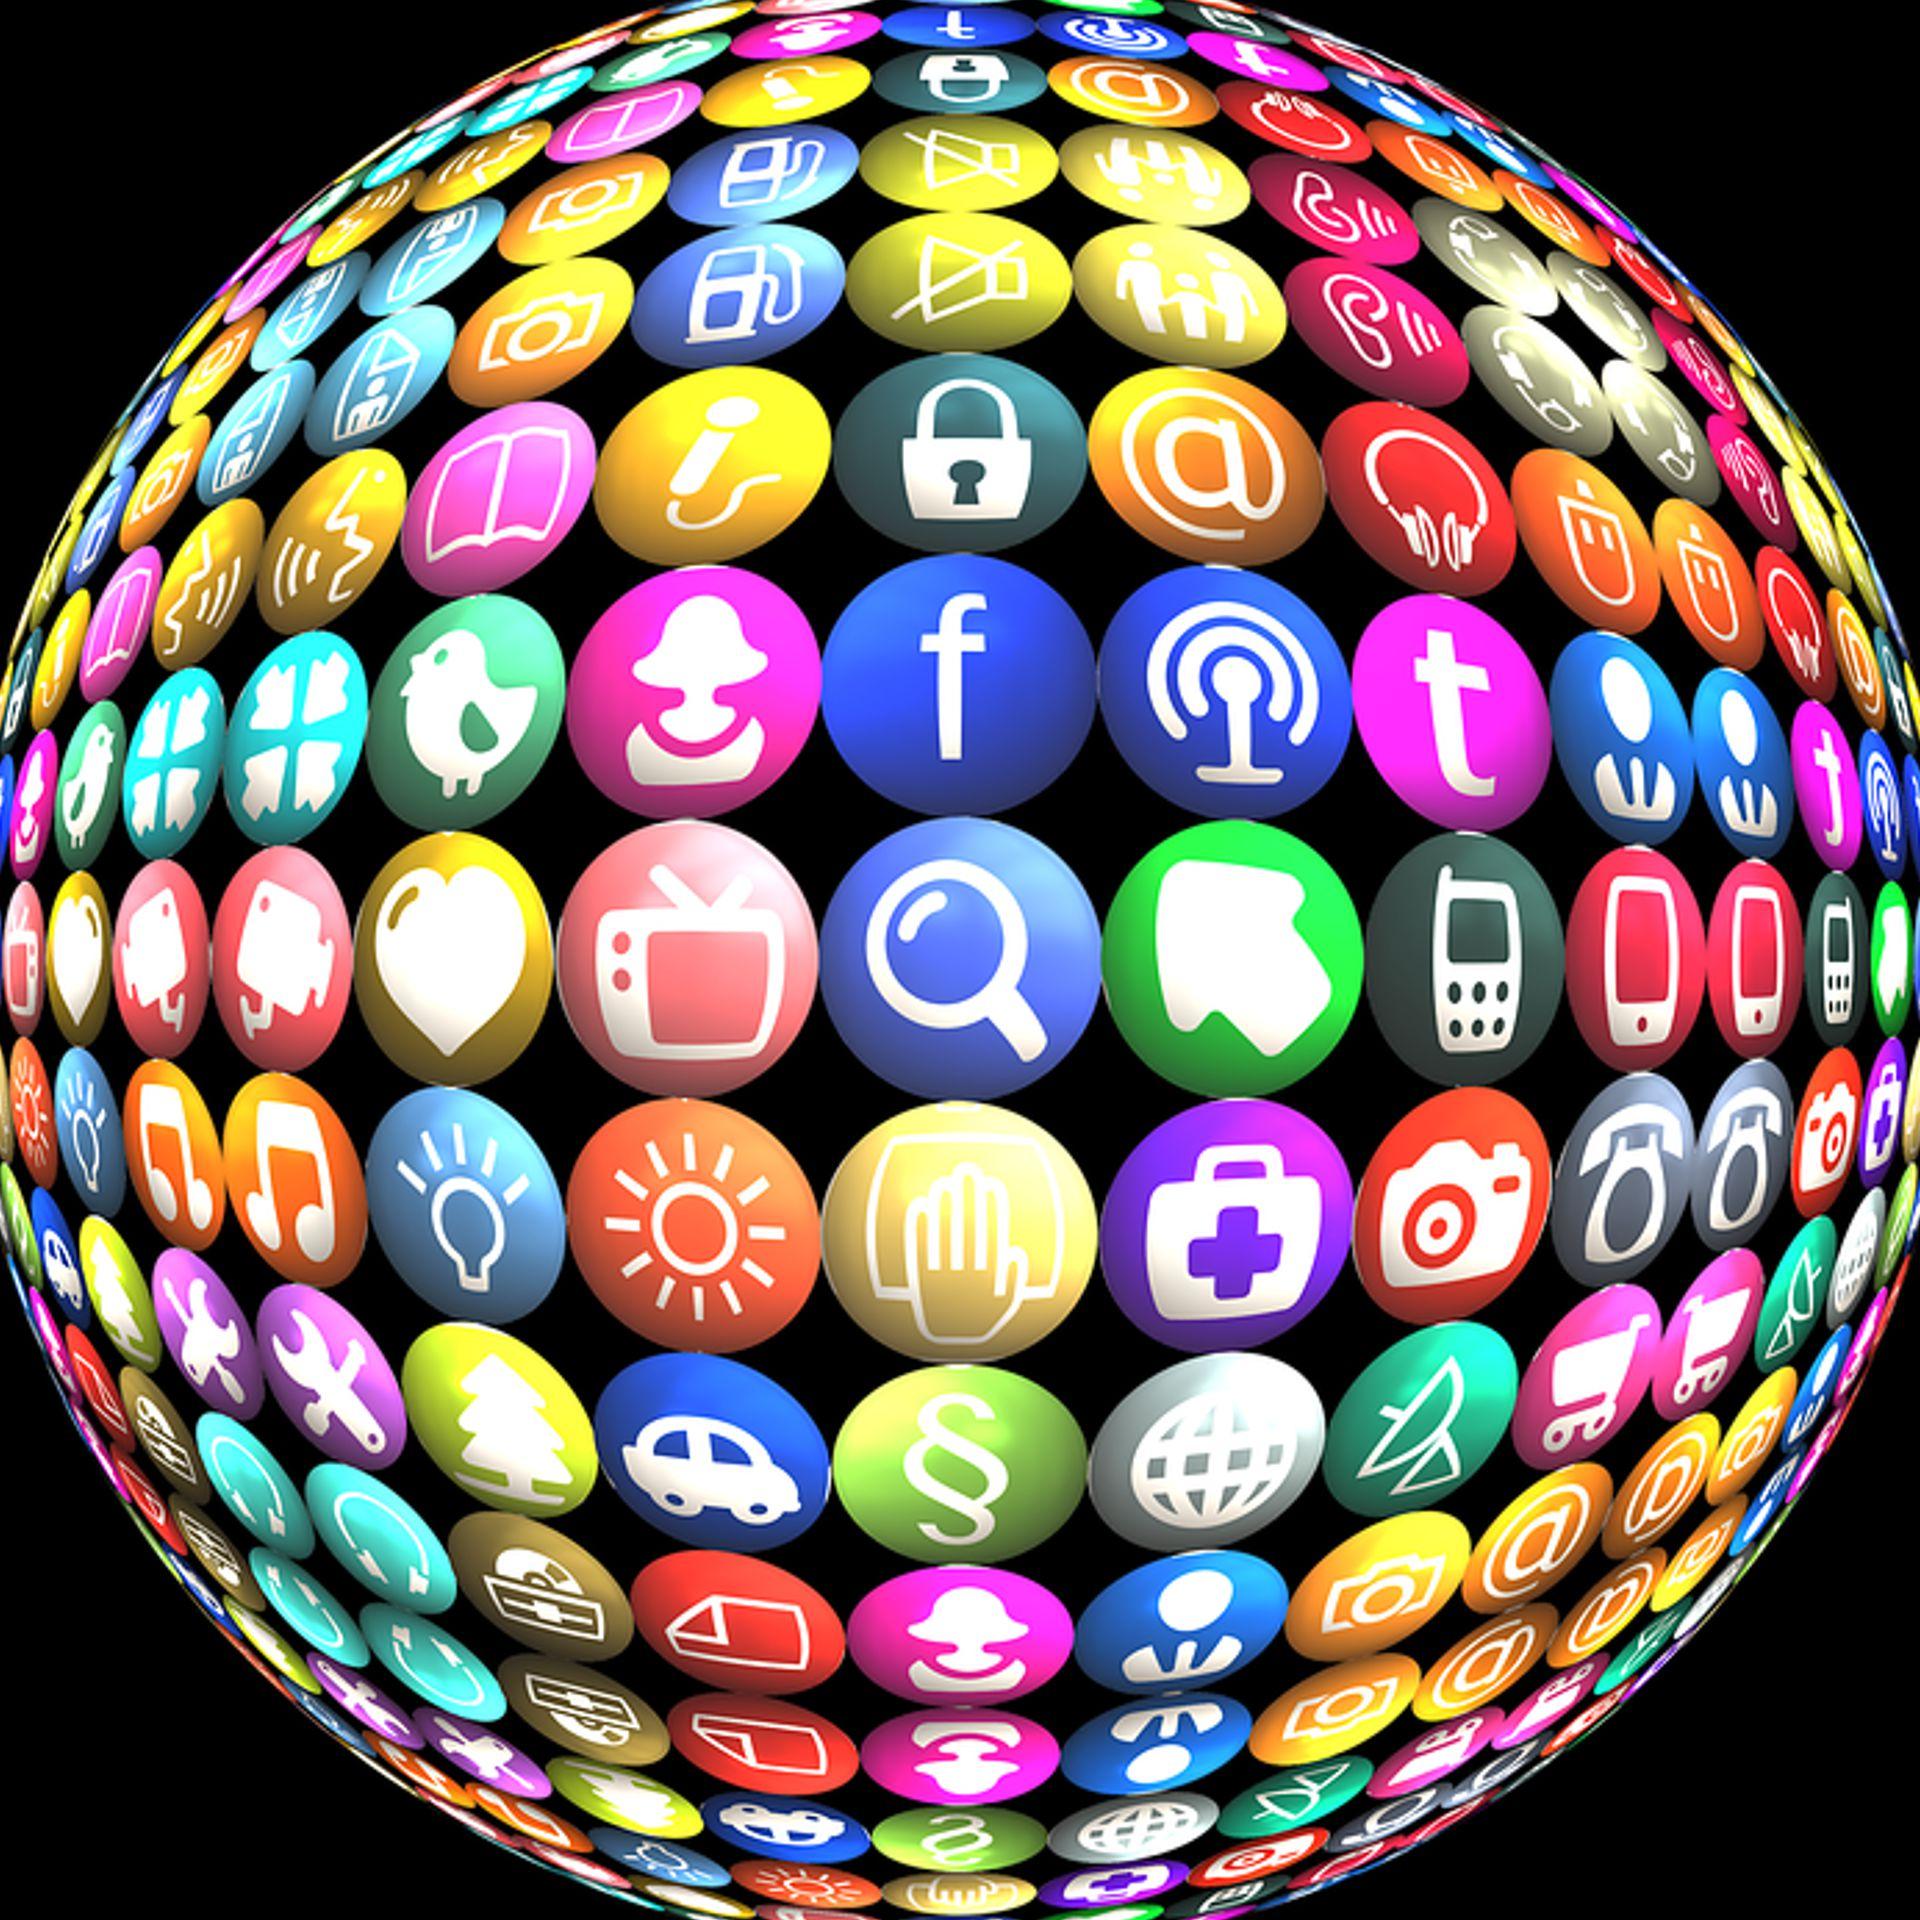 foto cc0 pixabay geralt soziale netze 1